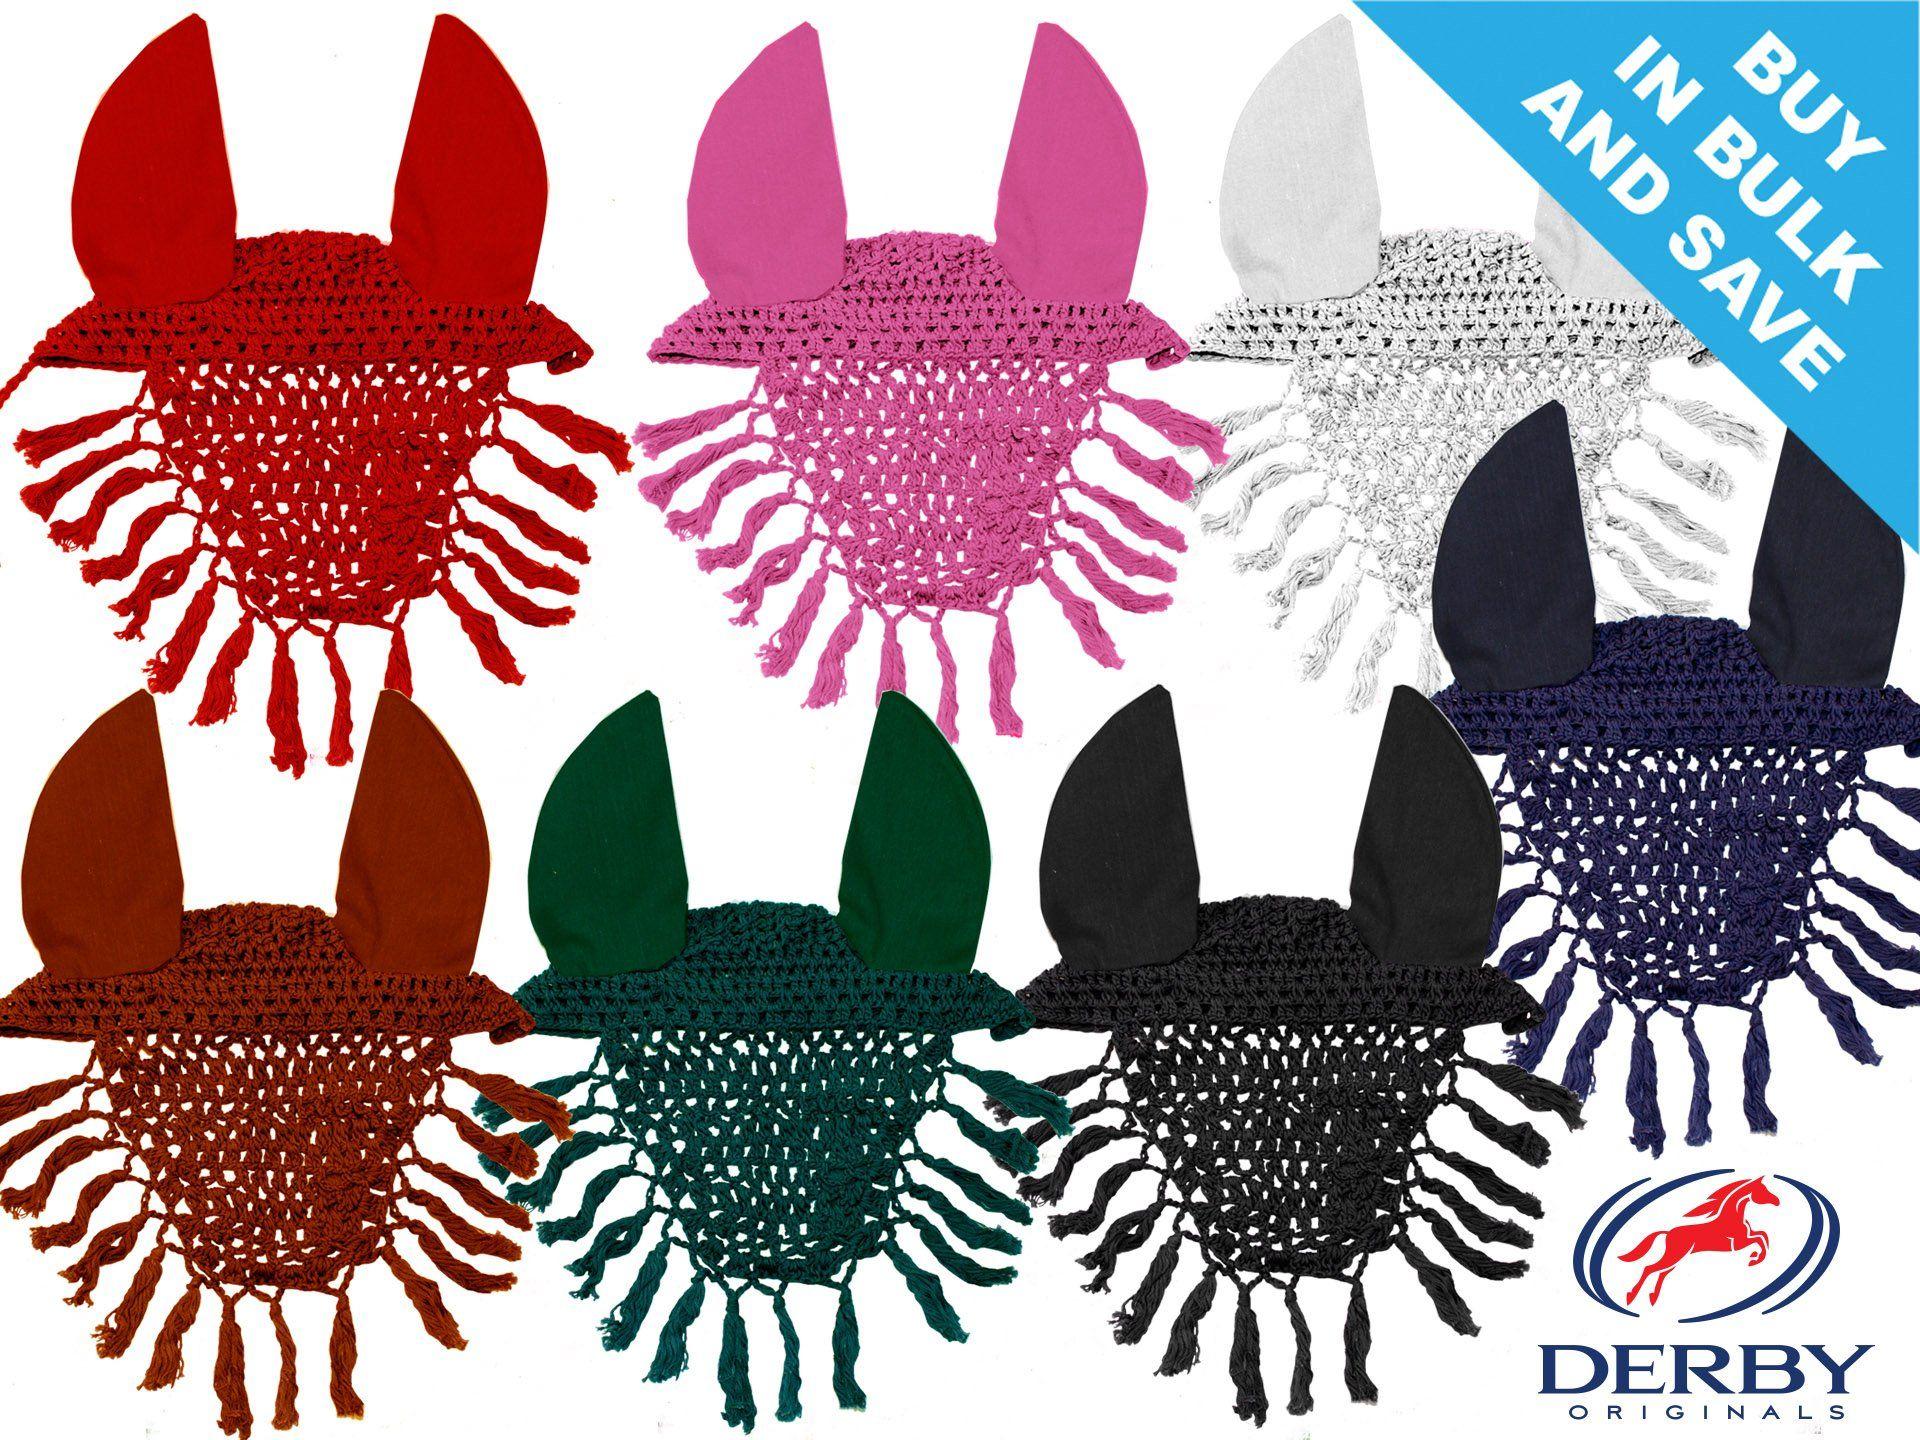 Crochet Horse Fly Bonnet Pattern Crochet Horse Fly Veil | horse ...